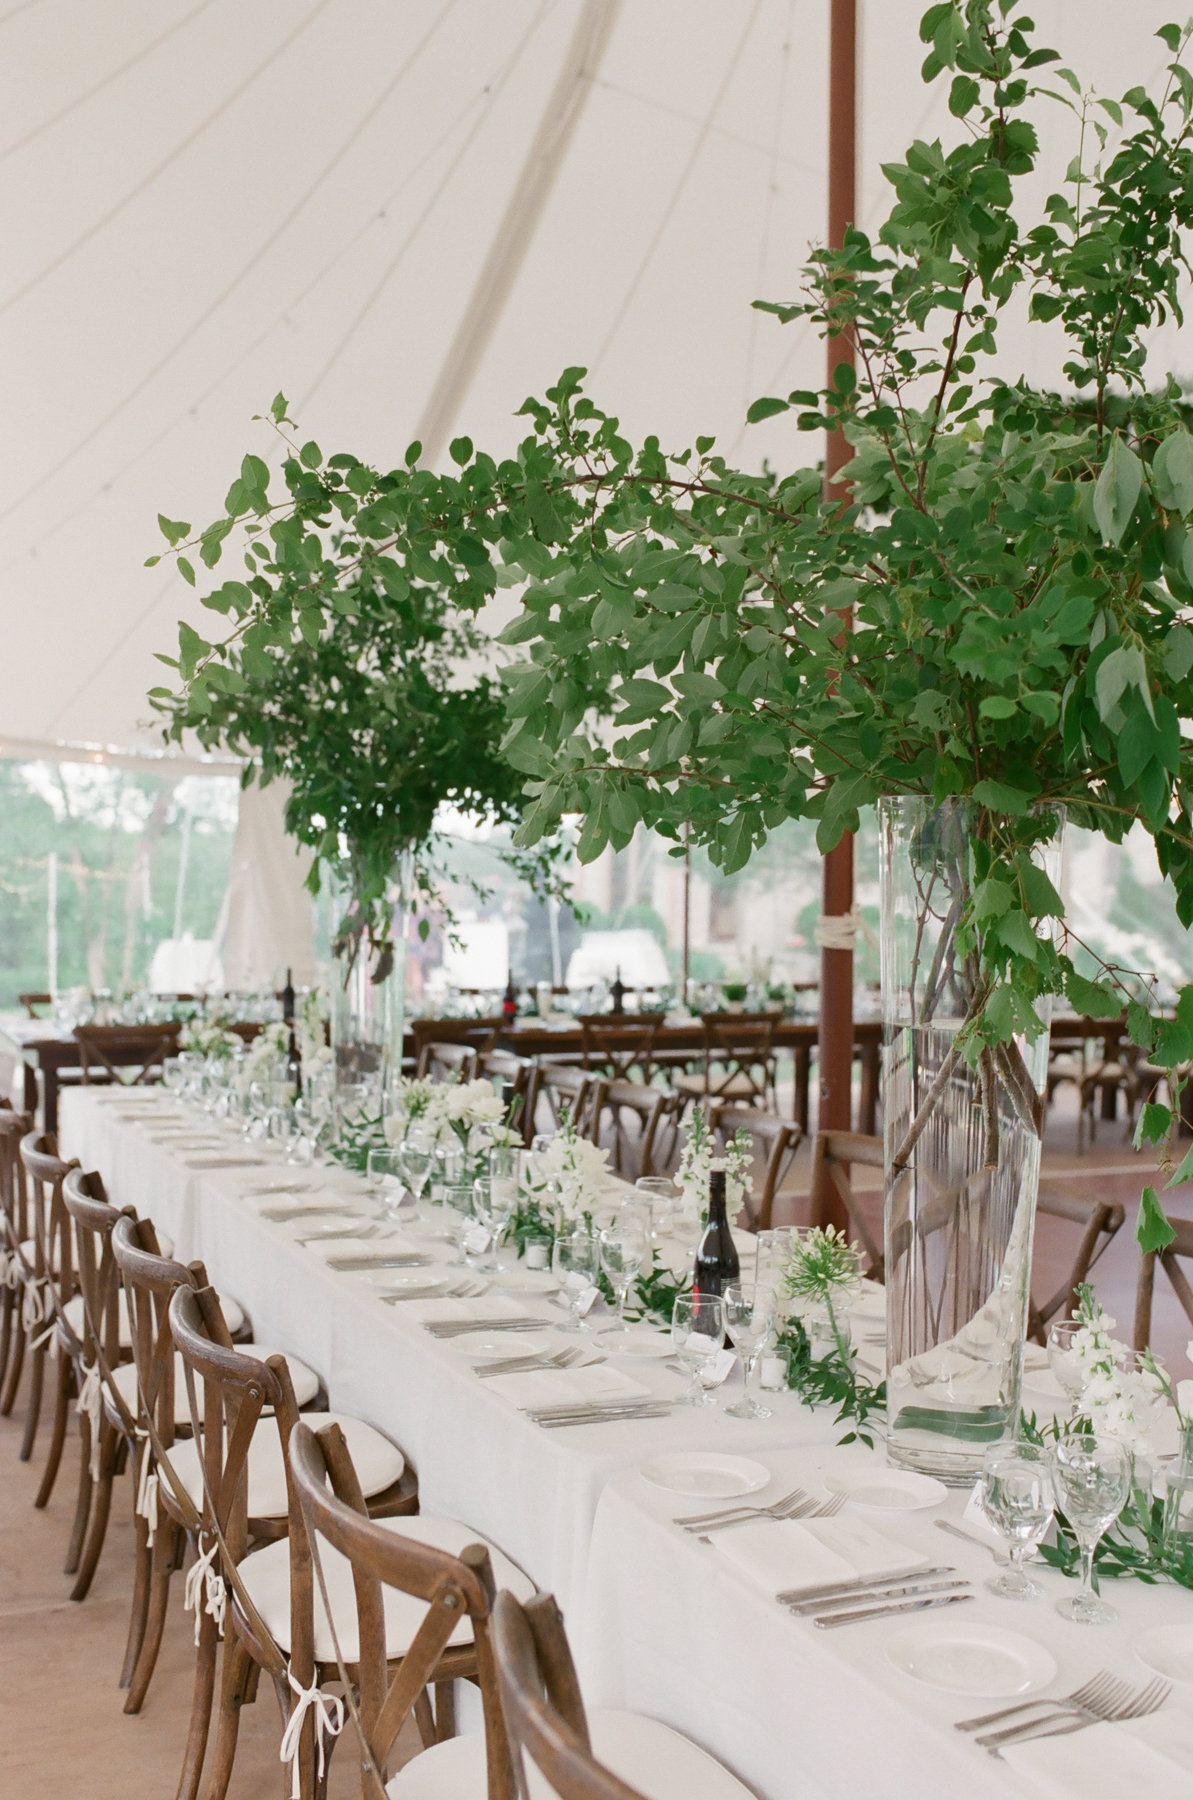 0826-maggiebrett-private-estate-wedding-000006330028.jpg